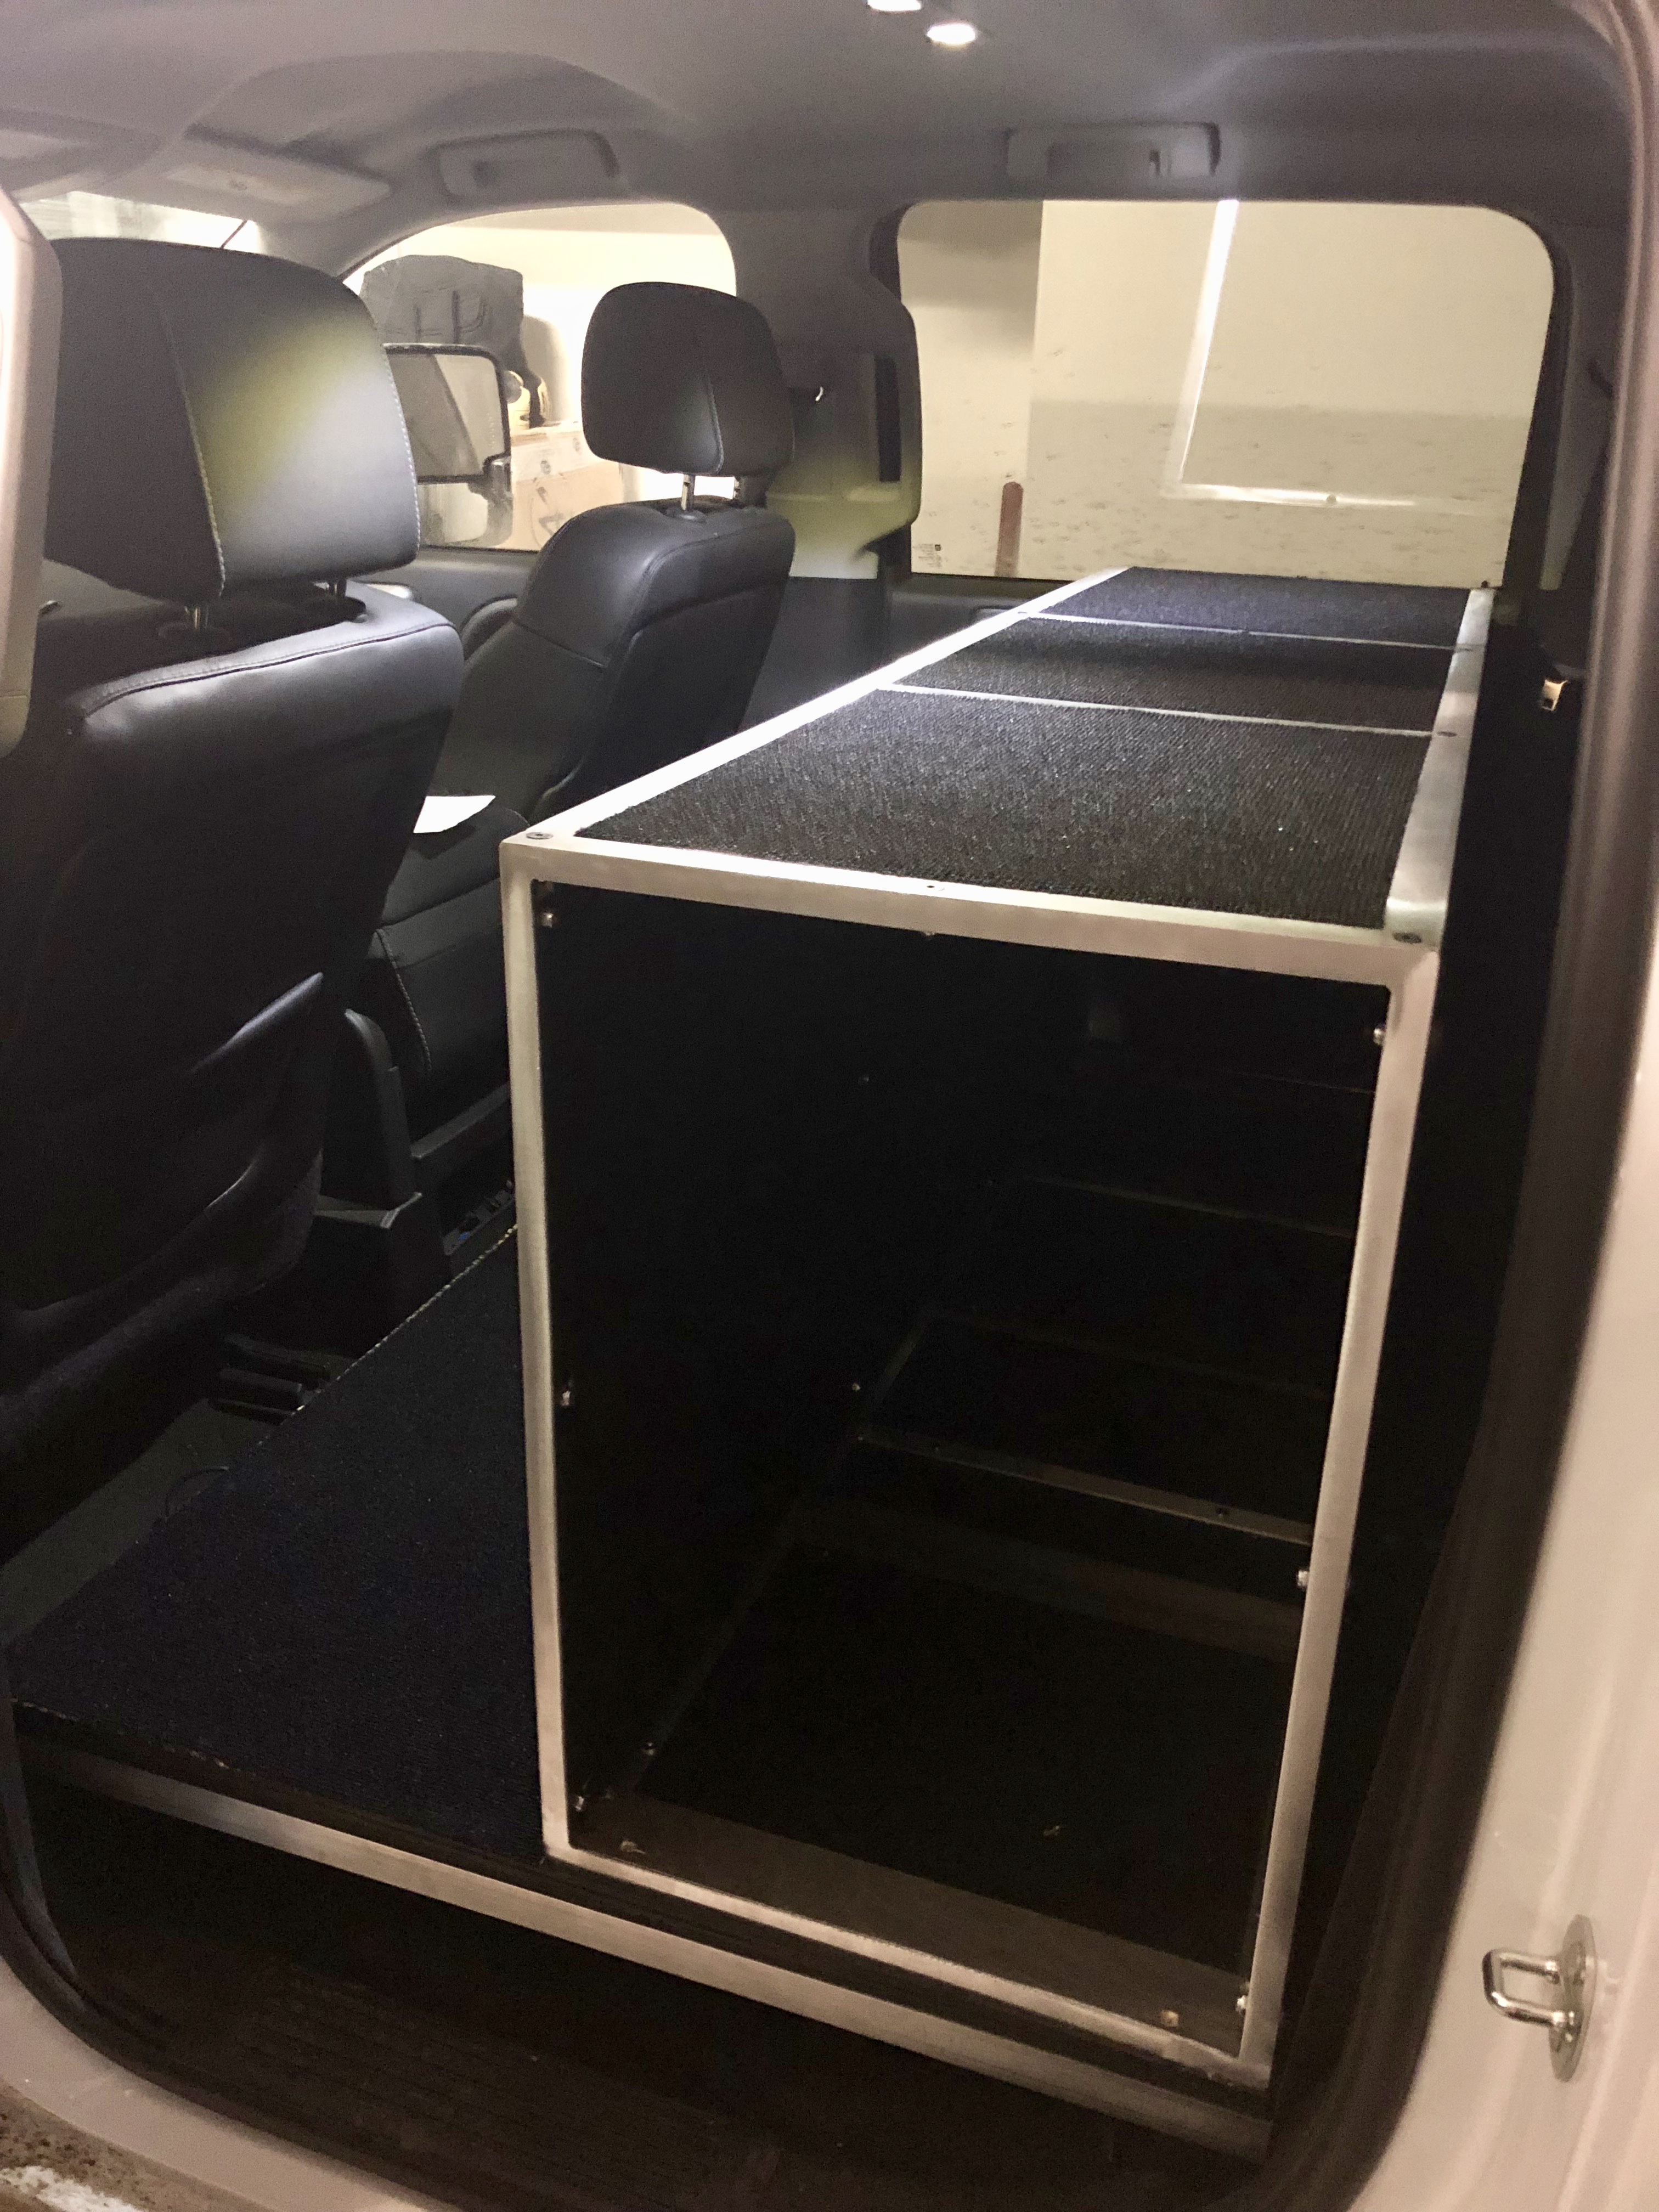 Backseat Drawer Storage System Truck Camper Adventure